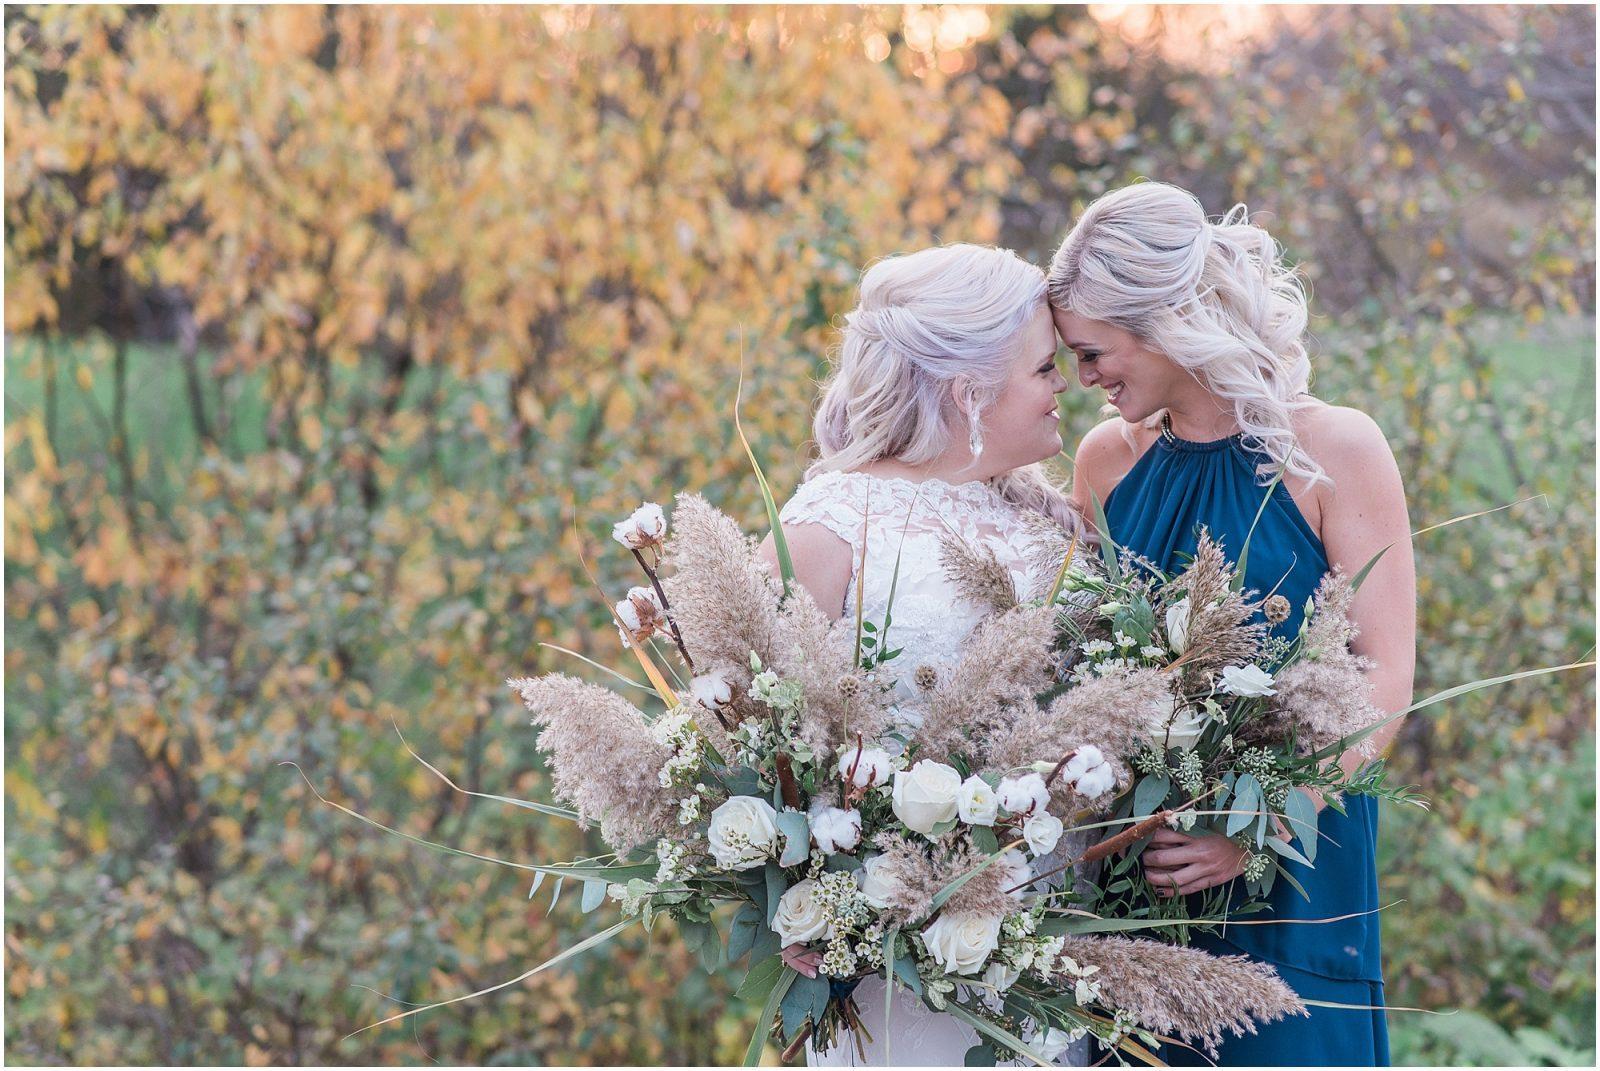 0061 Bethany and Luc - Fall Backyard Ottawa Wedding - Copper and Navy - PhotosbyEmmaH.jpg